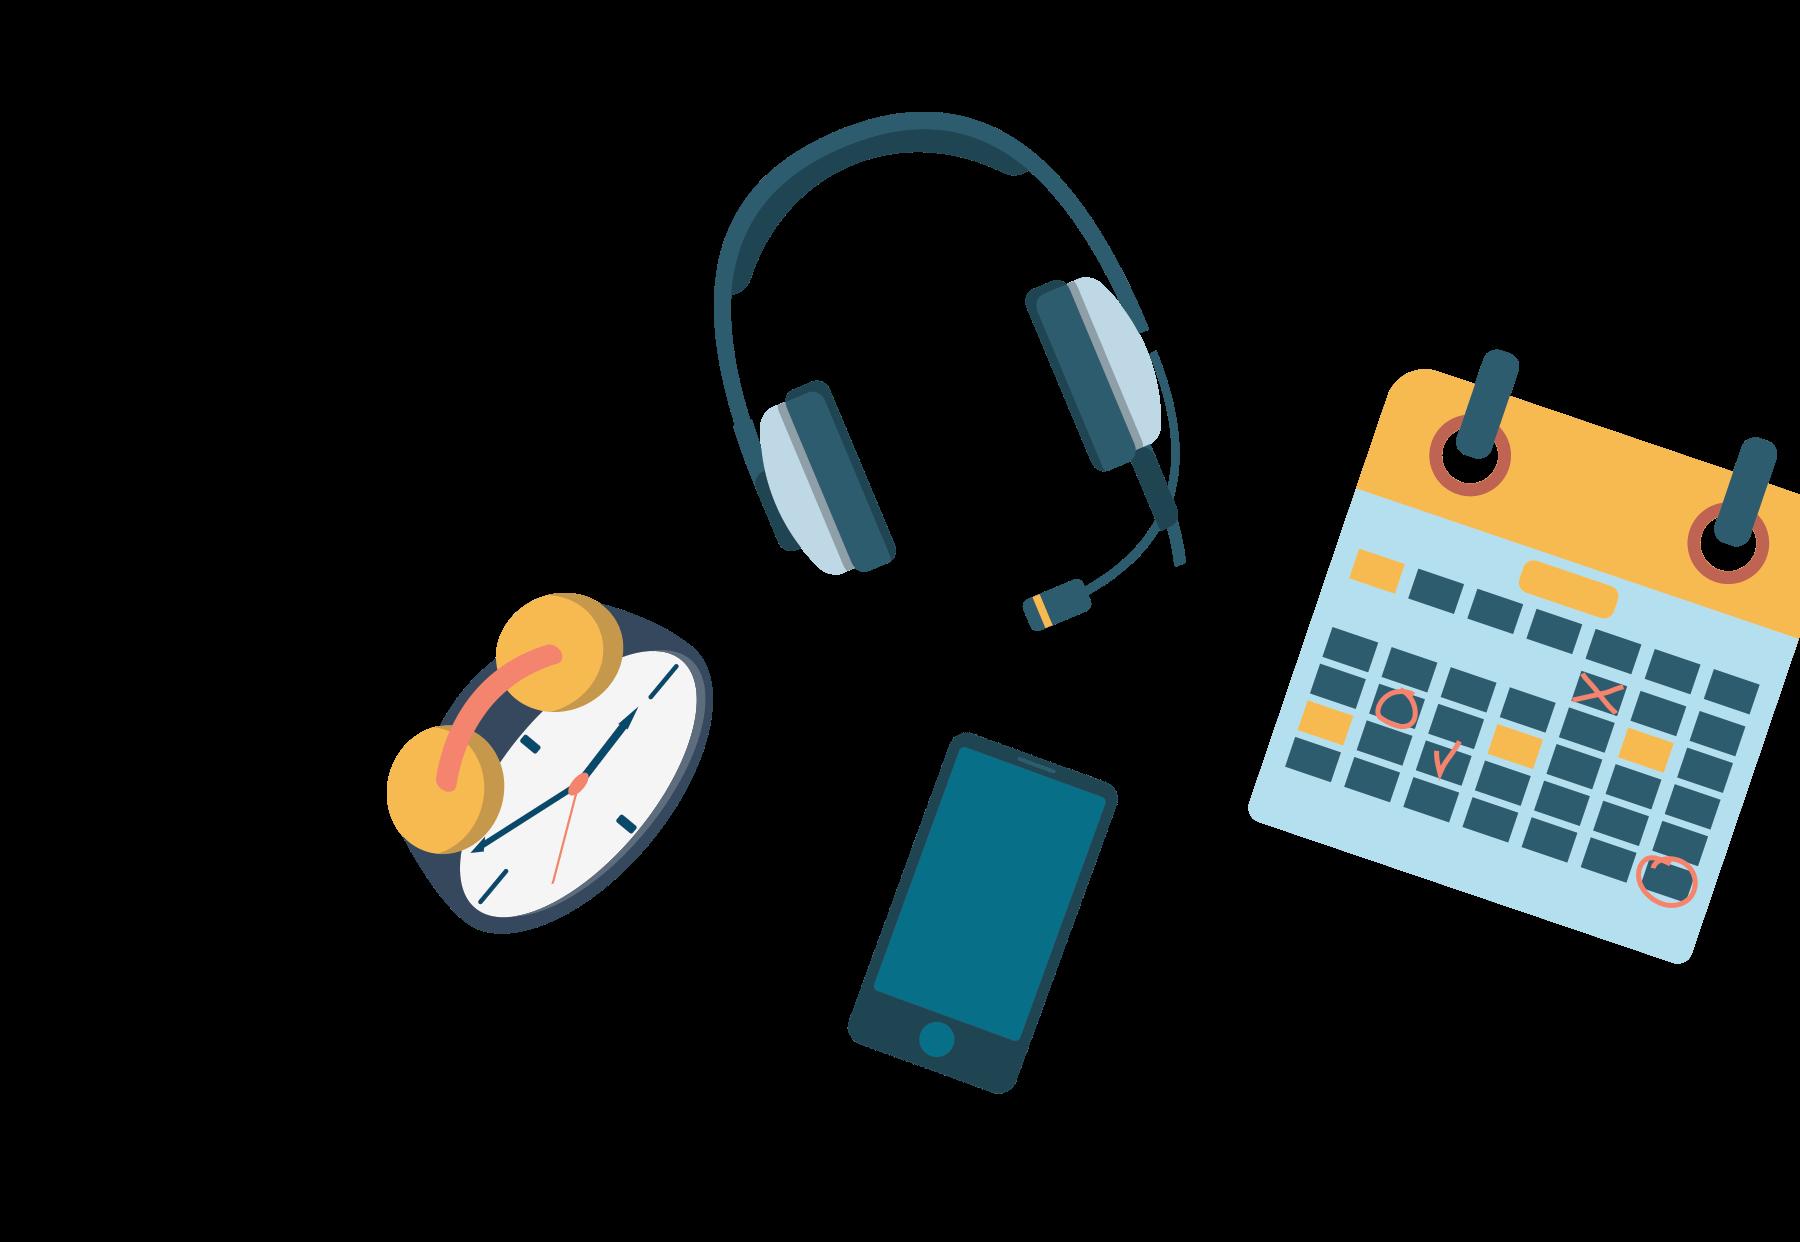 alarm-monitoring-technology-gadgets